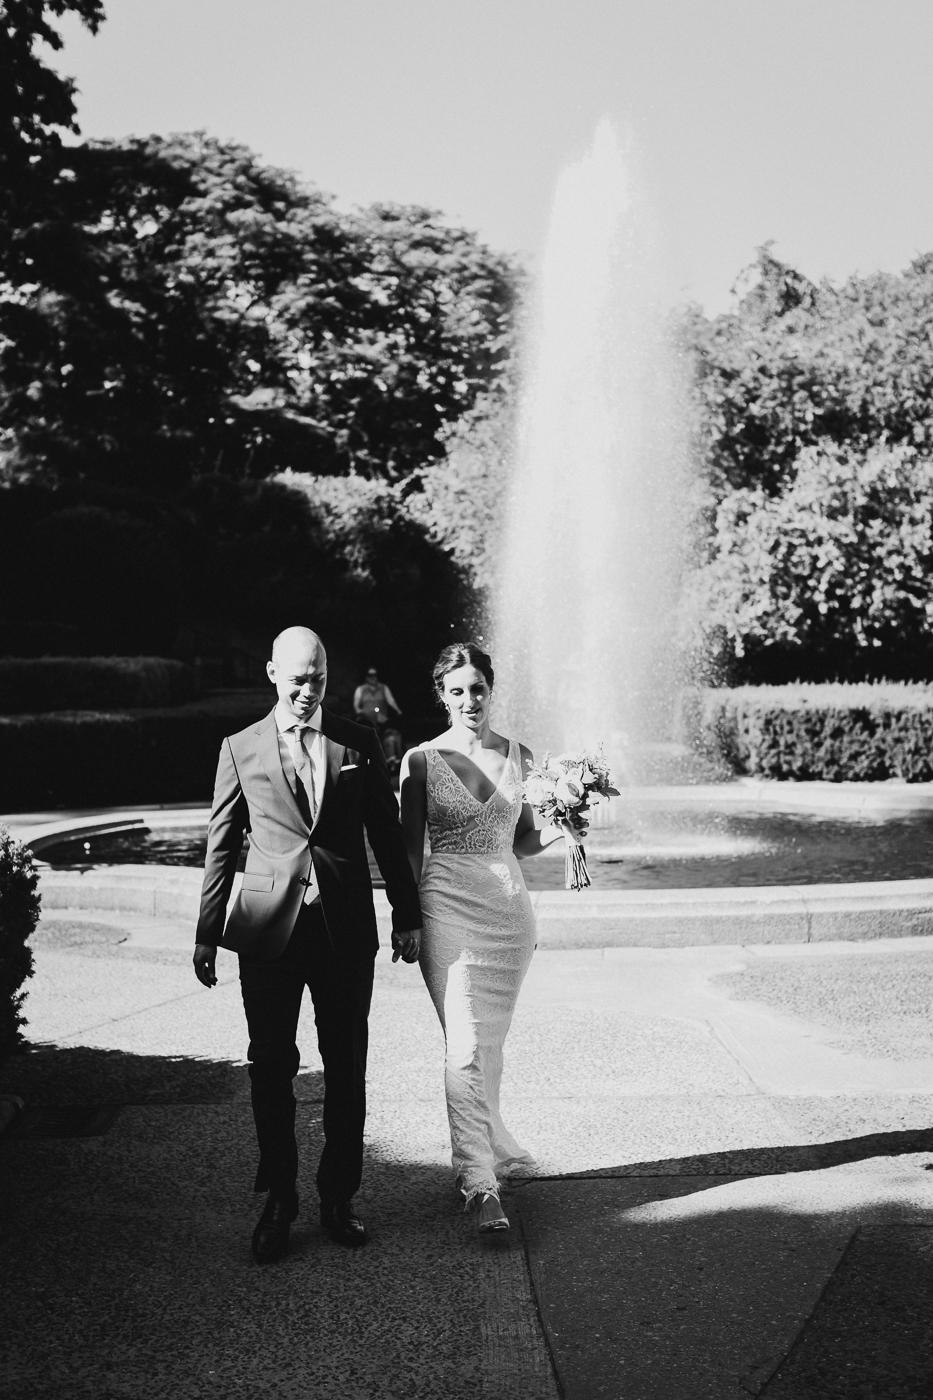 NYC-Central-Park-Conservatory-Garden-Intimate-Elopement-Documentary-Wedding-Photographer-37.jpg